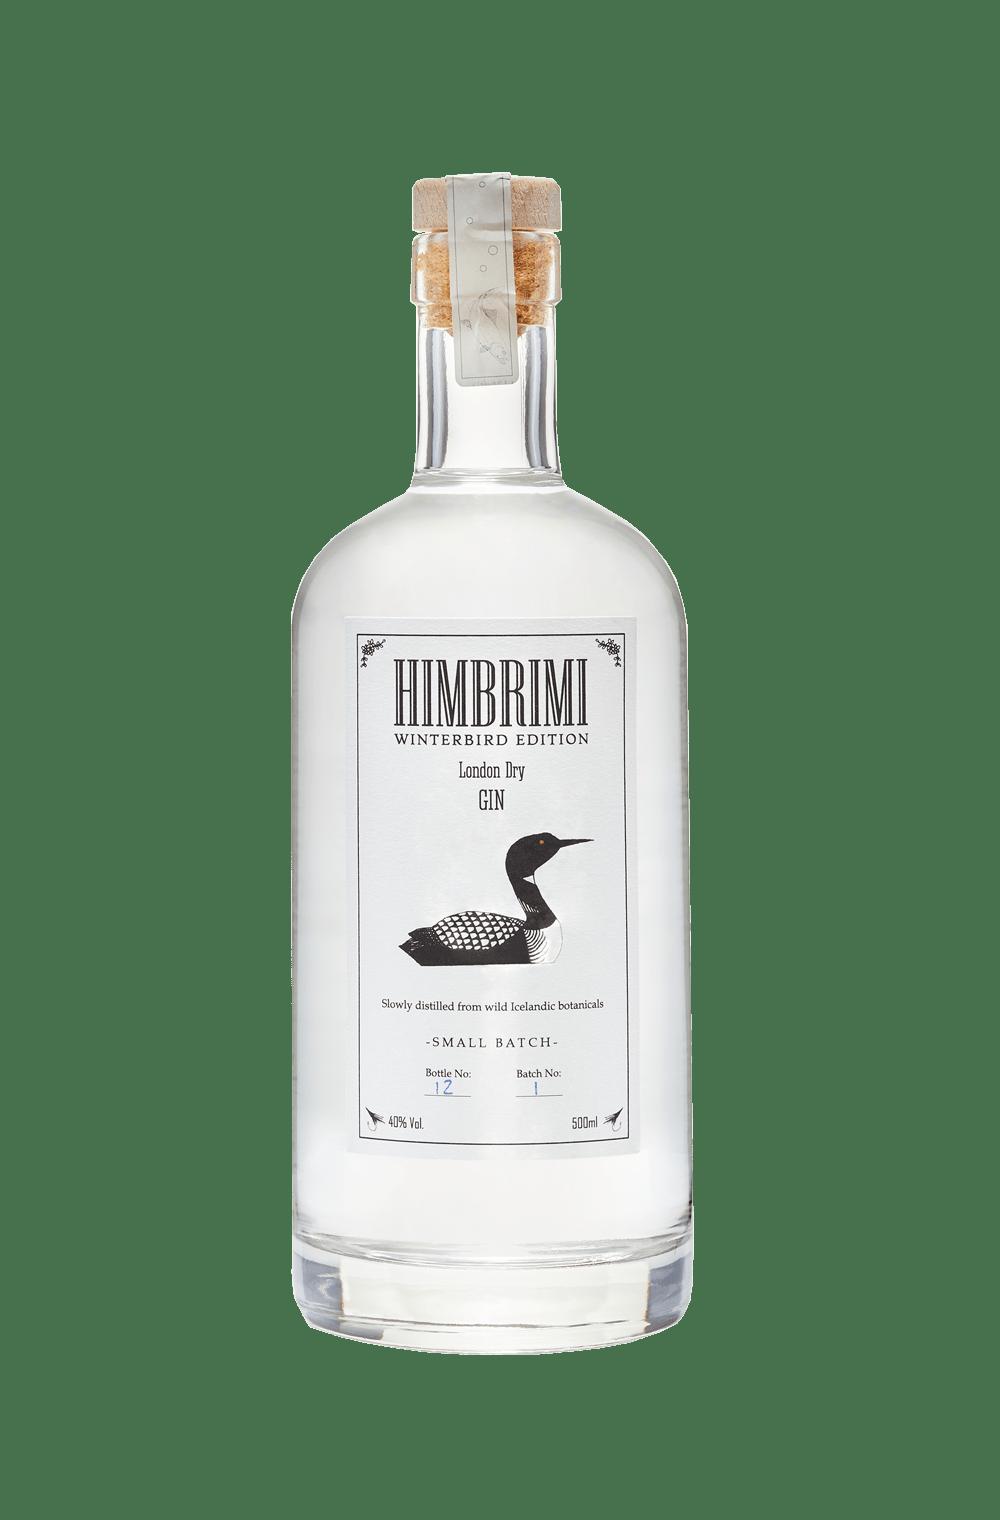 Himbrimi Winterbird London Dry Gin